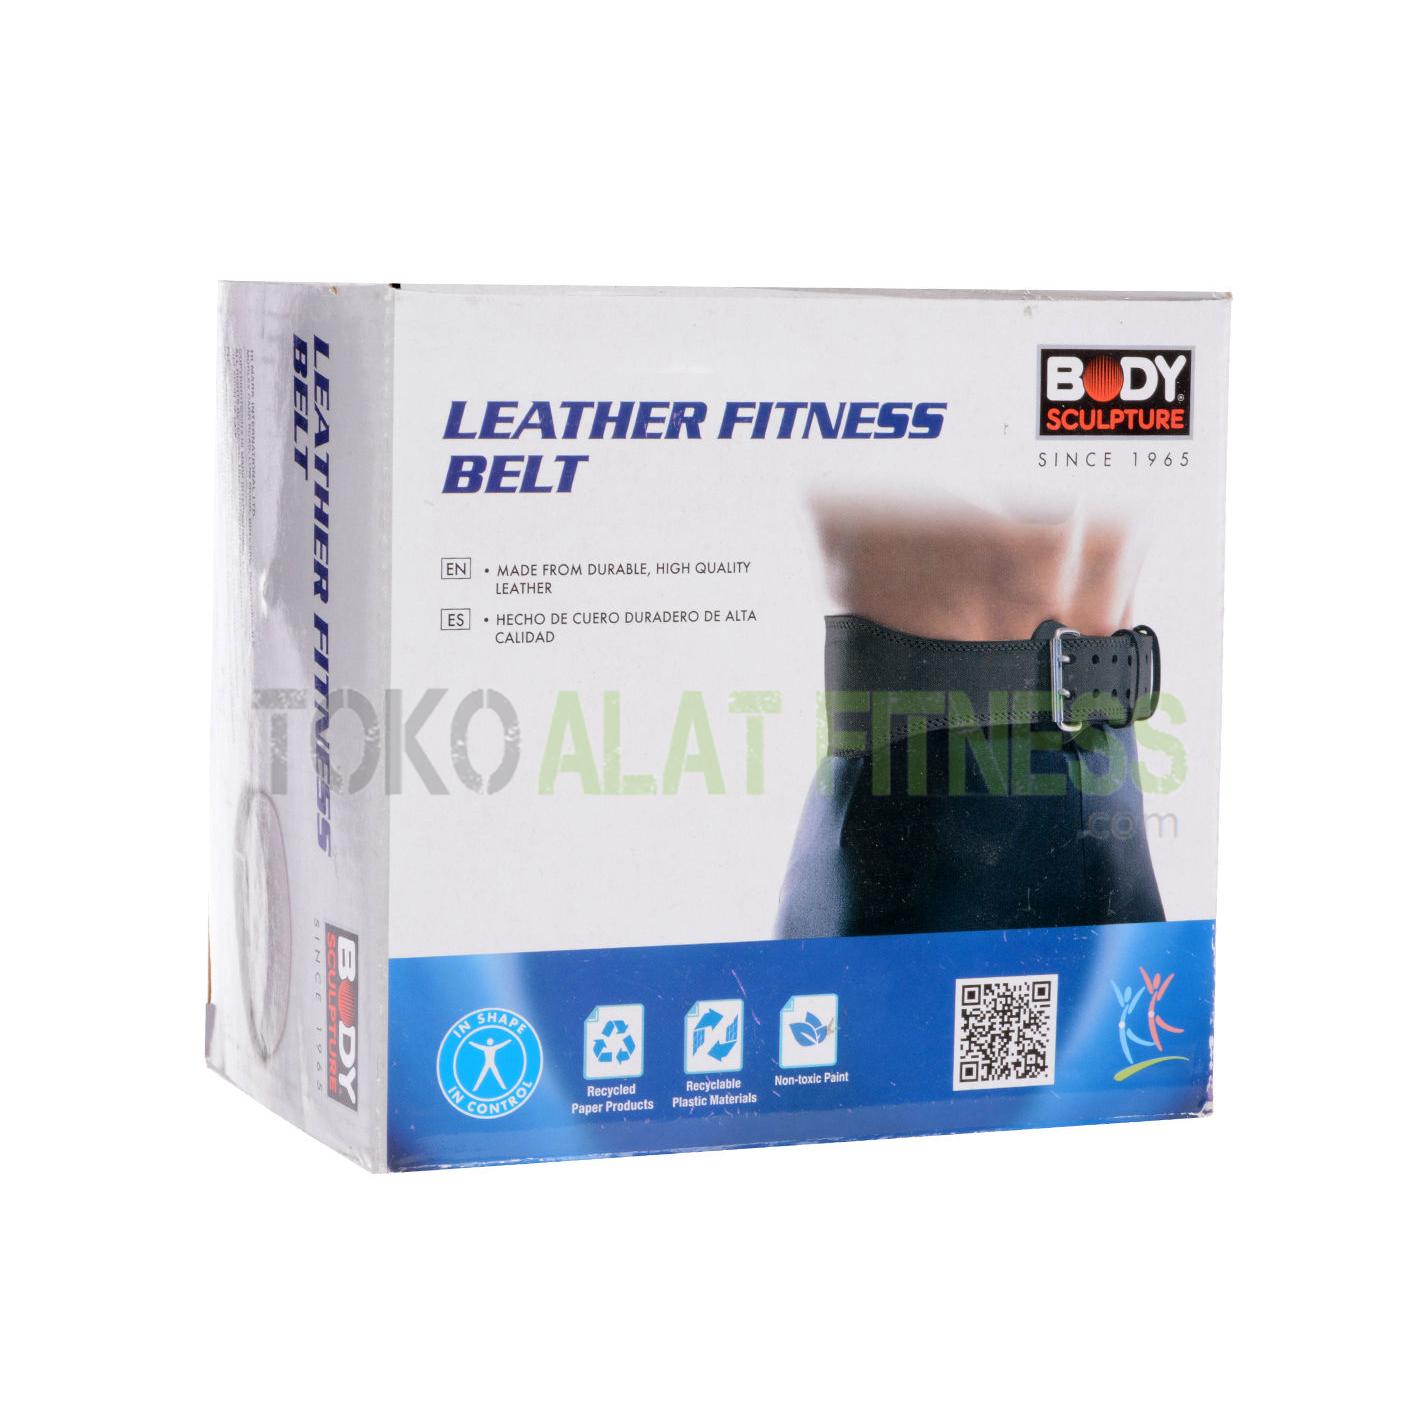 sabuk kulit bs krds - Sabuk Fitness Kulit (Weight Lifting Belt) M Hitam Body Sculpture